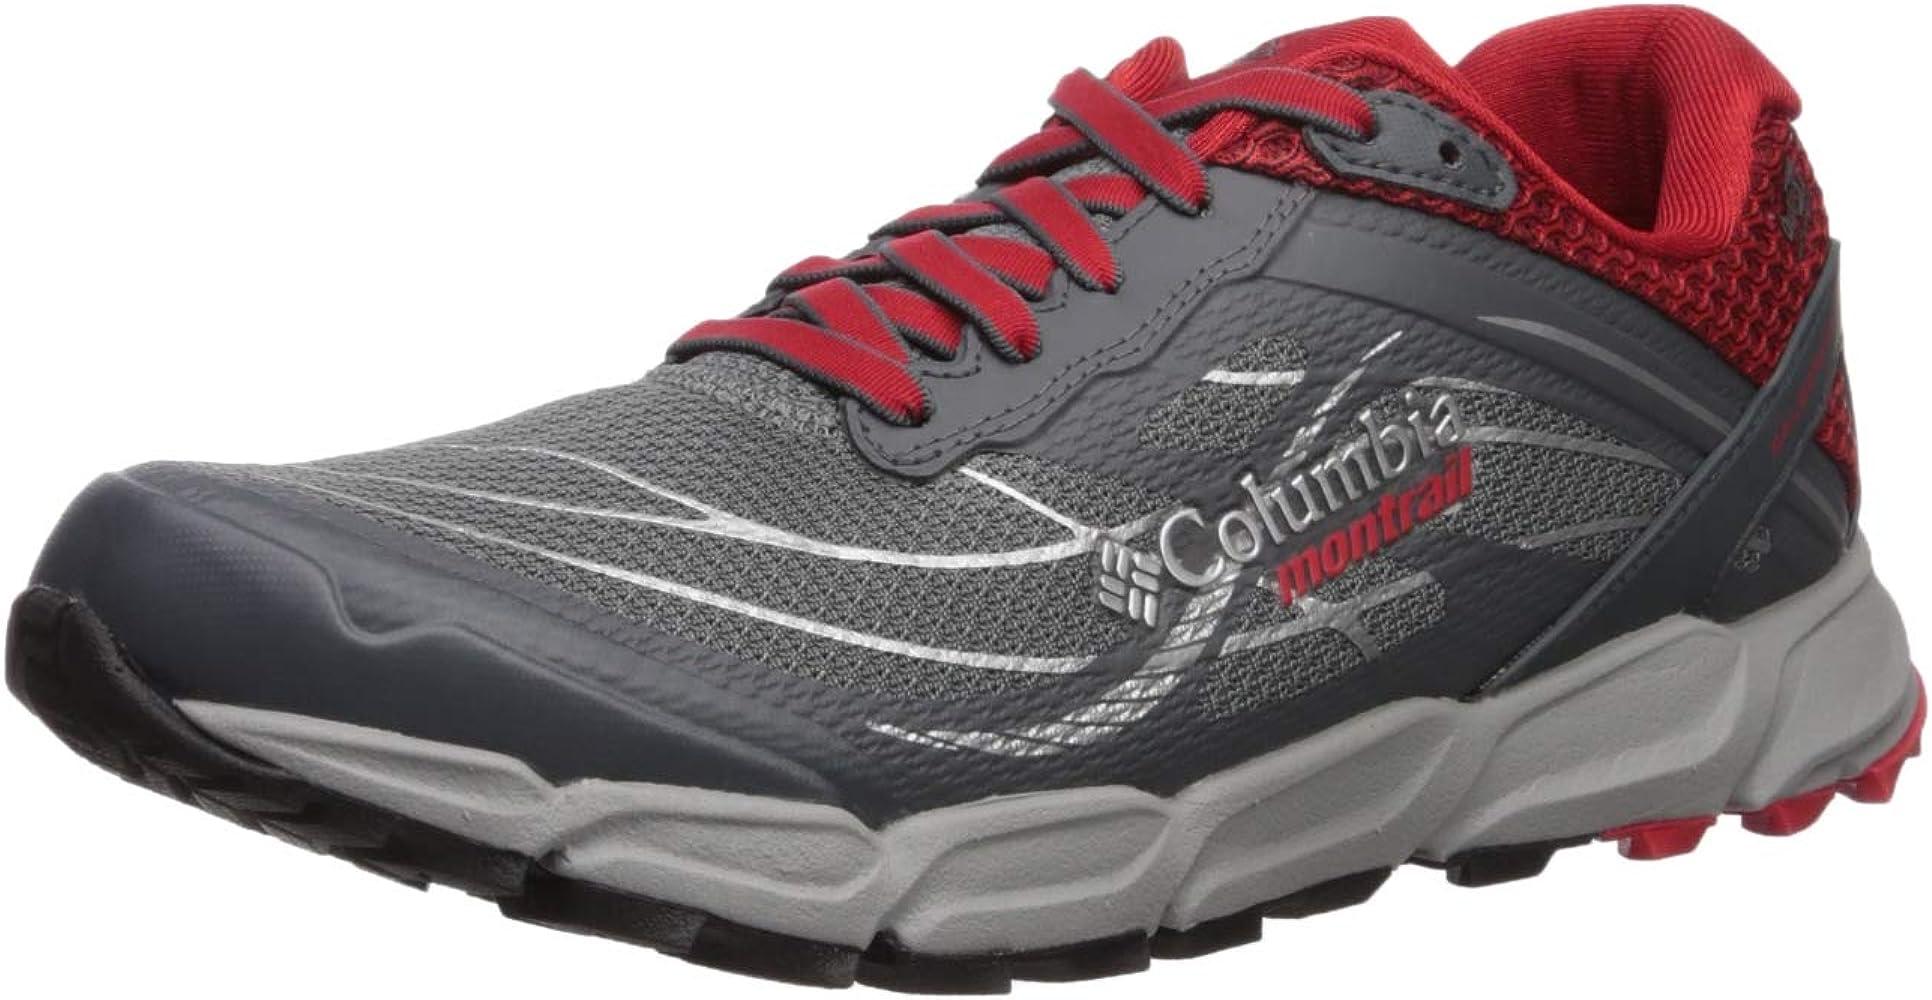 adidas Caldorado III Outdry, Zapatillas de Running para Asfalto para Hombre, Gris (Ti Grey Steel, 037), 44 EU: Amazon.es: Zapatos y complementos